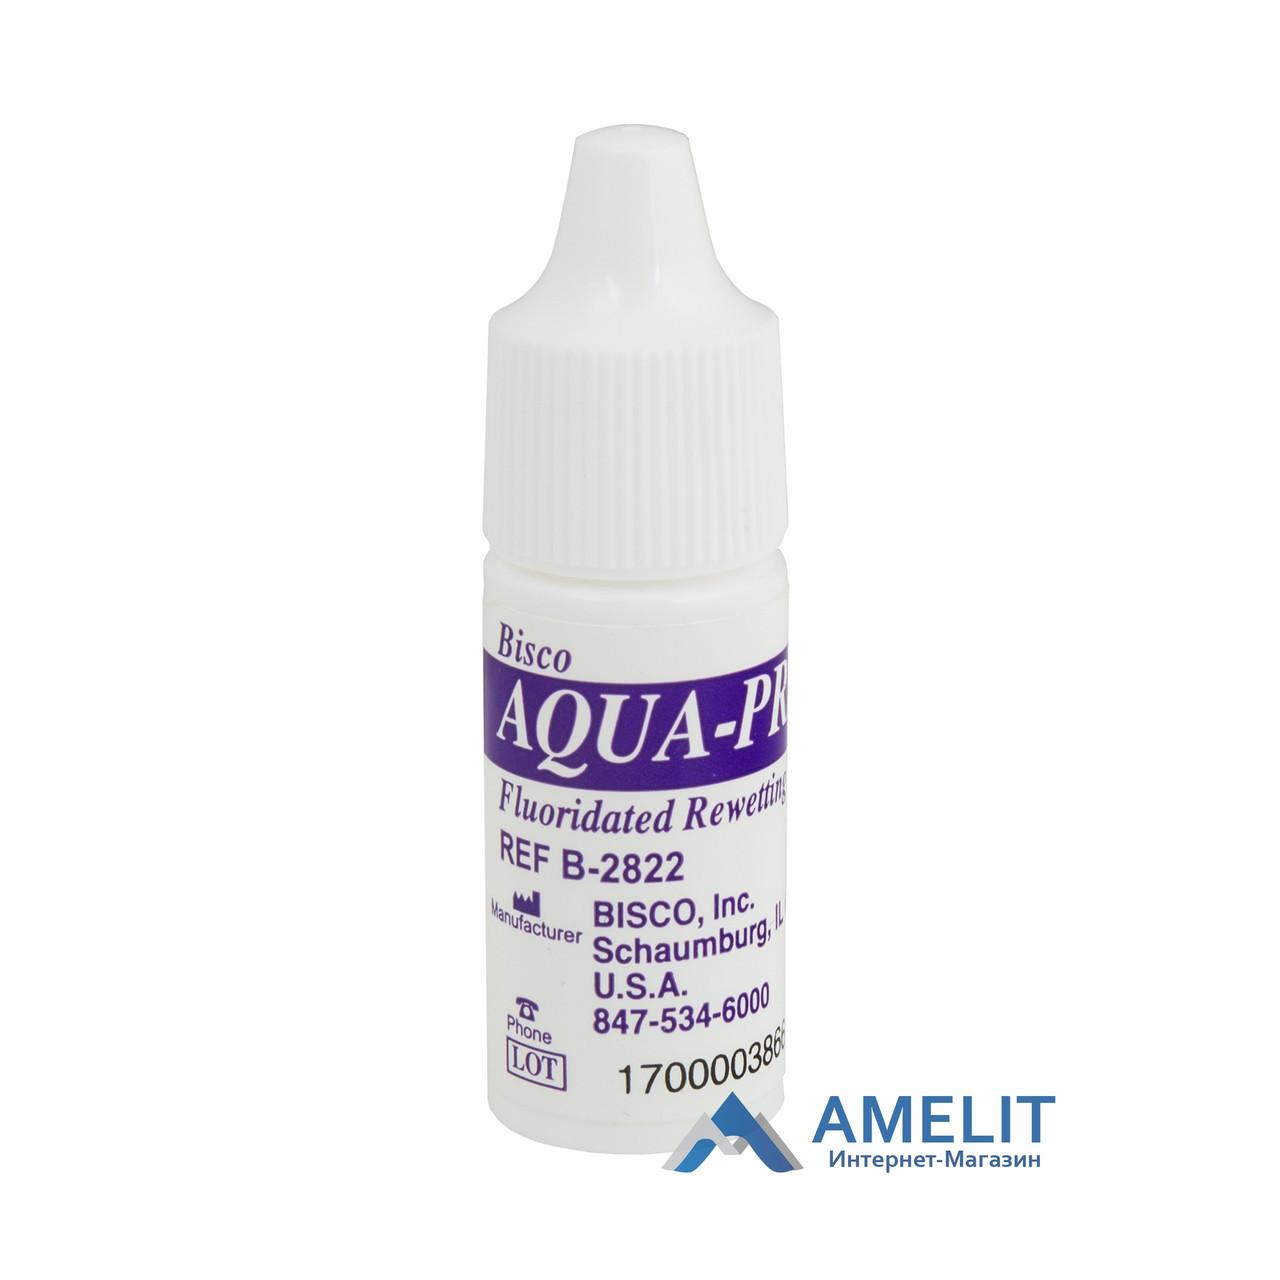 Аква-преп Ф (Aqua-Prep F,Bisco), жидкость 6мл